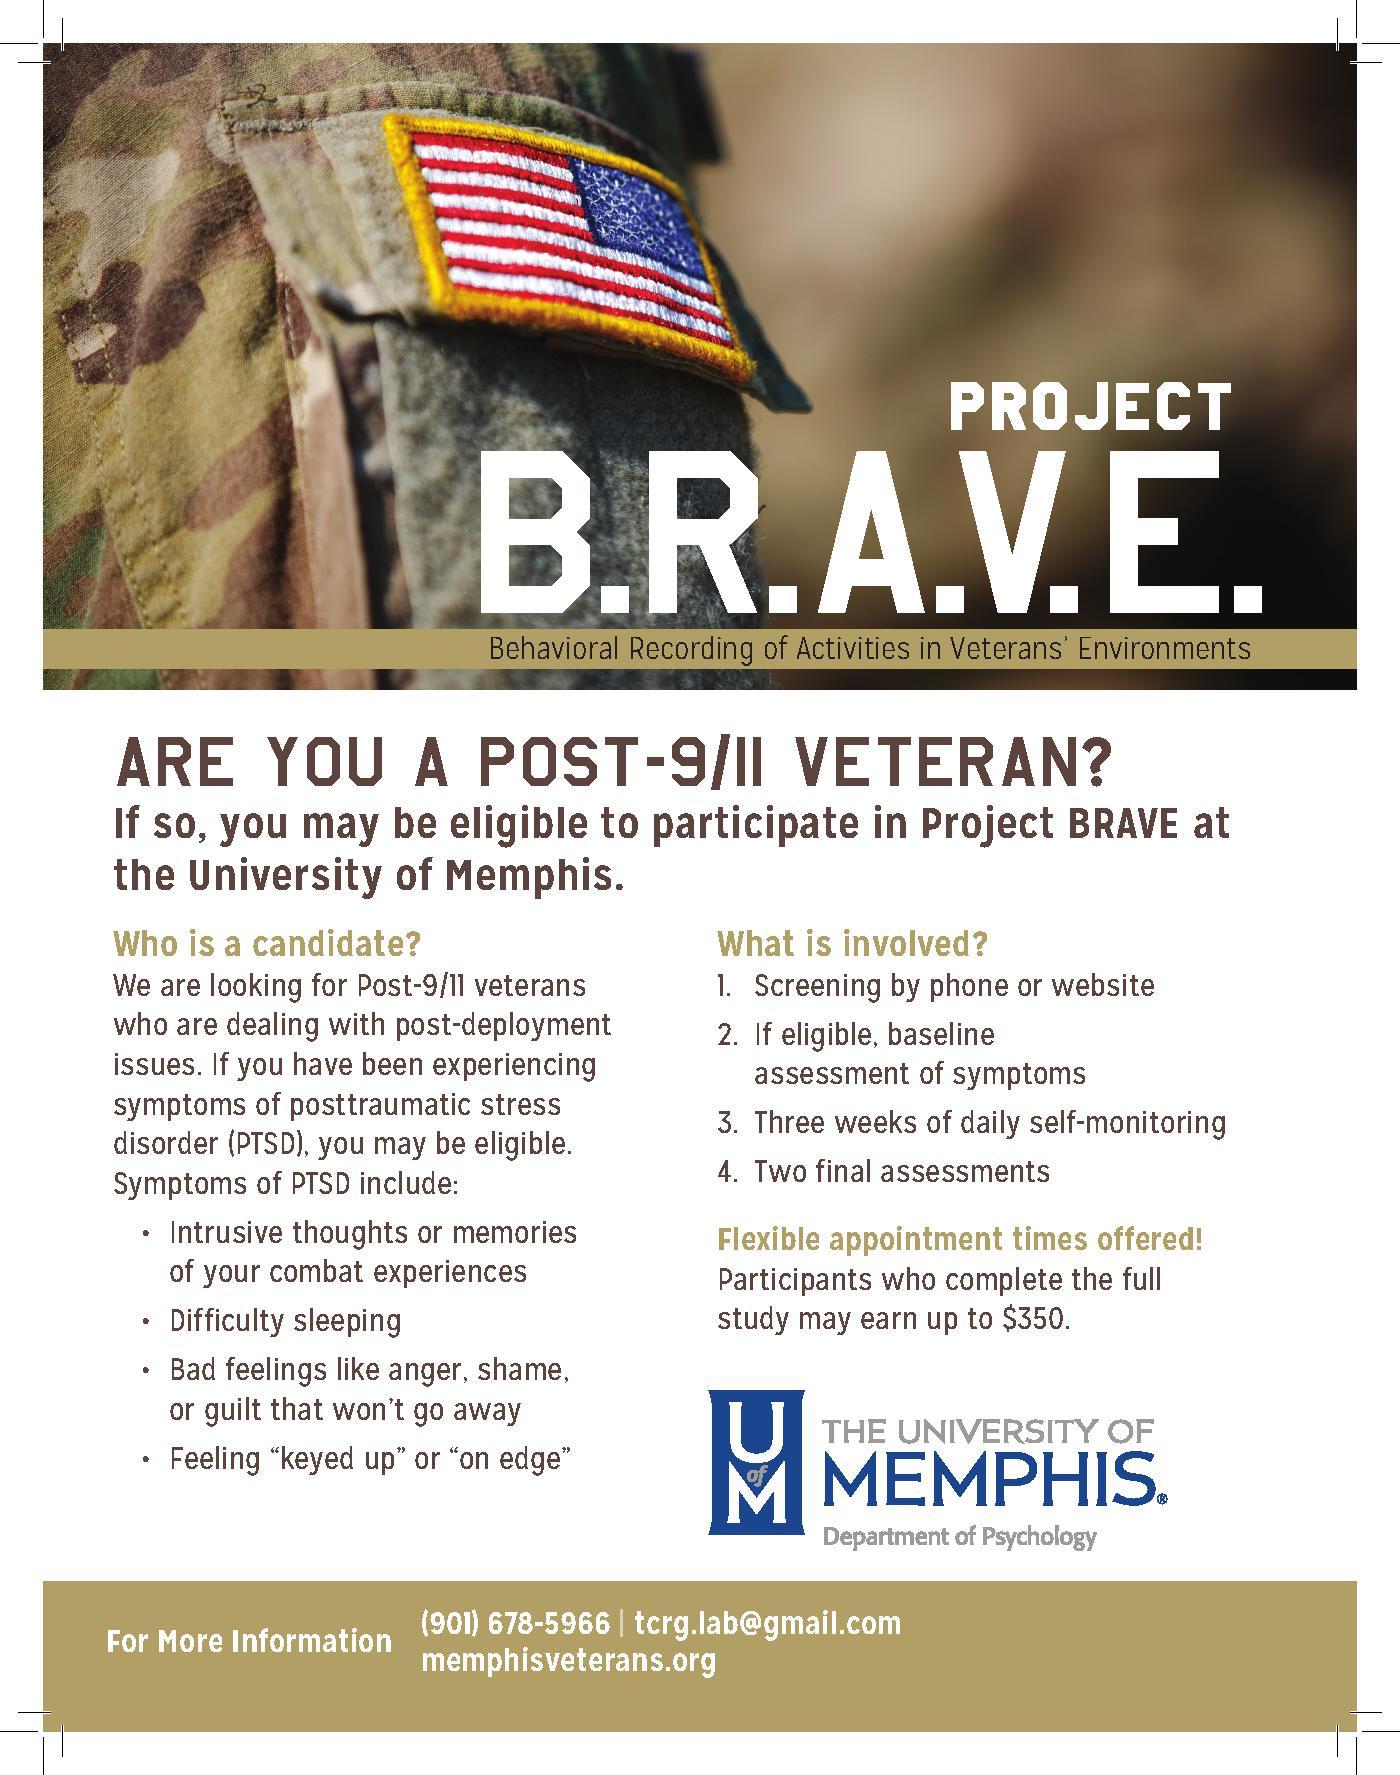 project-brave-flyer-university-of-memphis_1